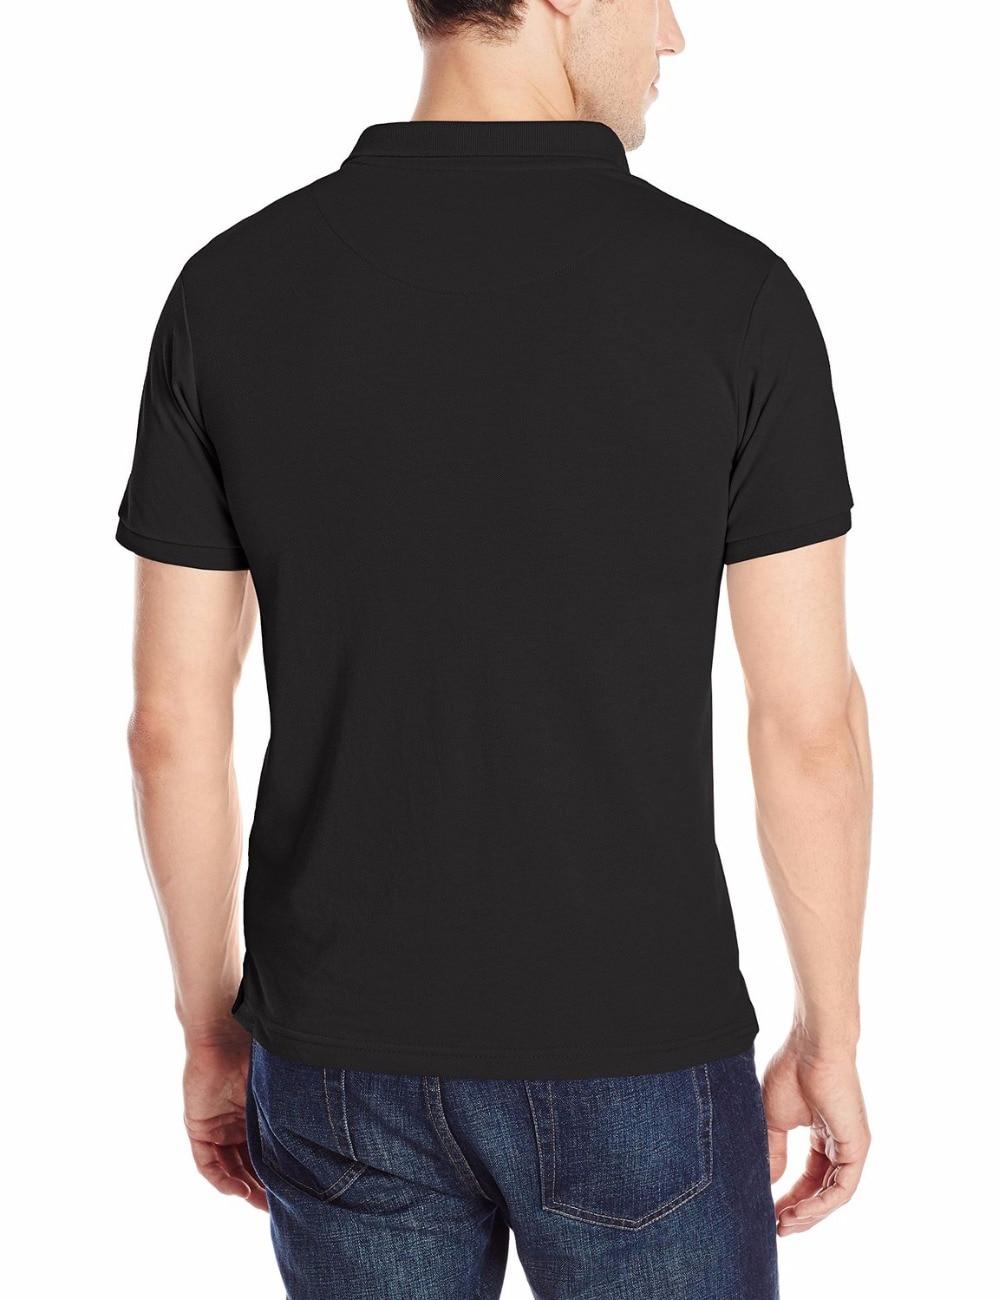 2018 Mens Polo Shirt Space Jam Print Polo Shirts Mens Shirts Camisa Polo Black White Cotton T-Shirts Top